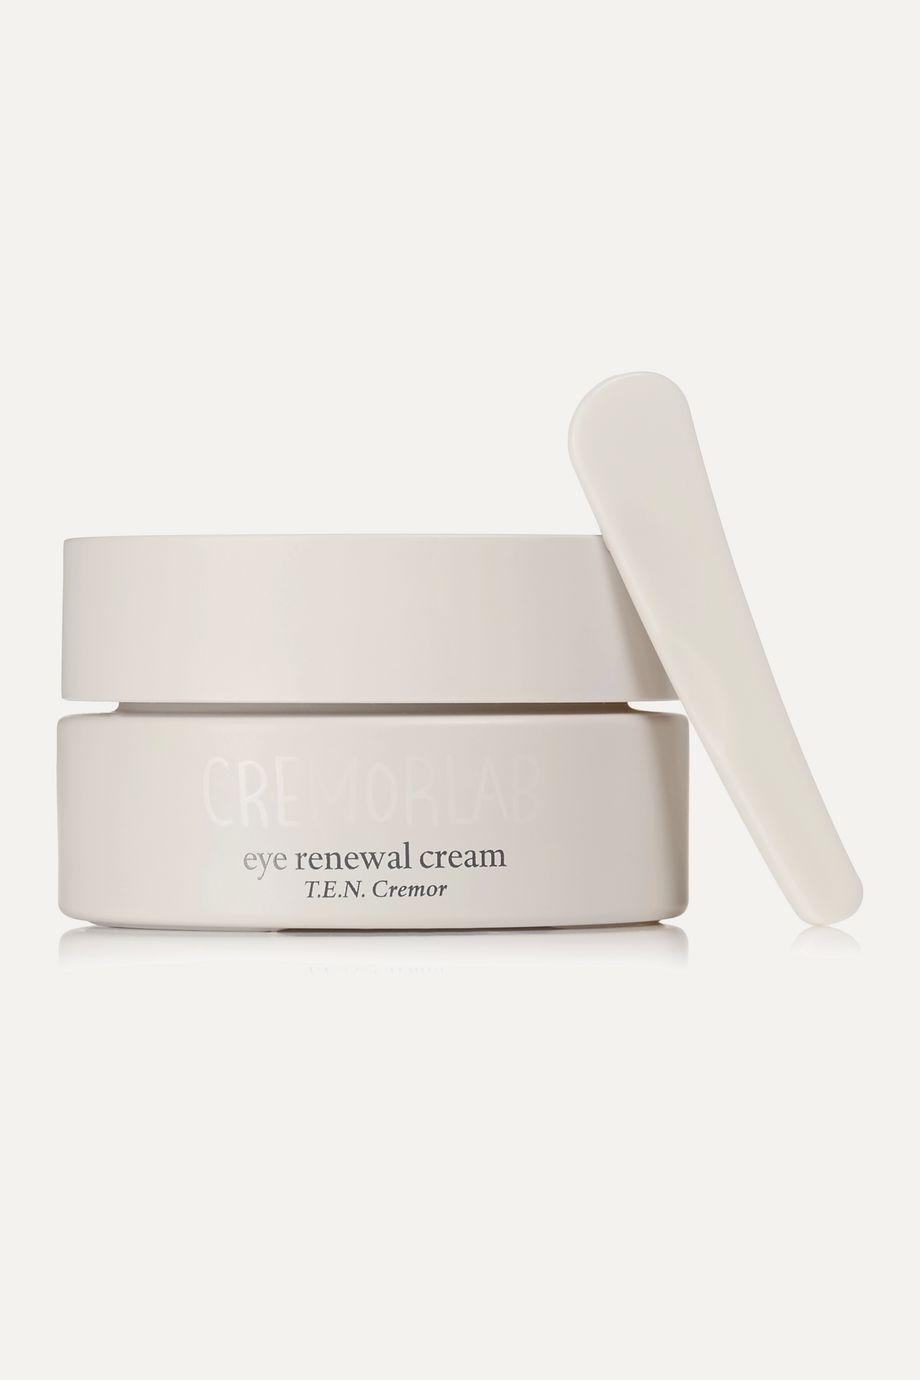 Cremorlab T.E.N Cremor Eye Renewal Cream, 25ml